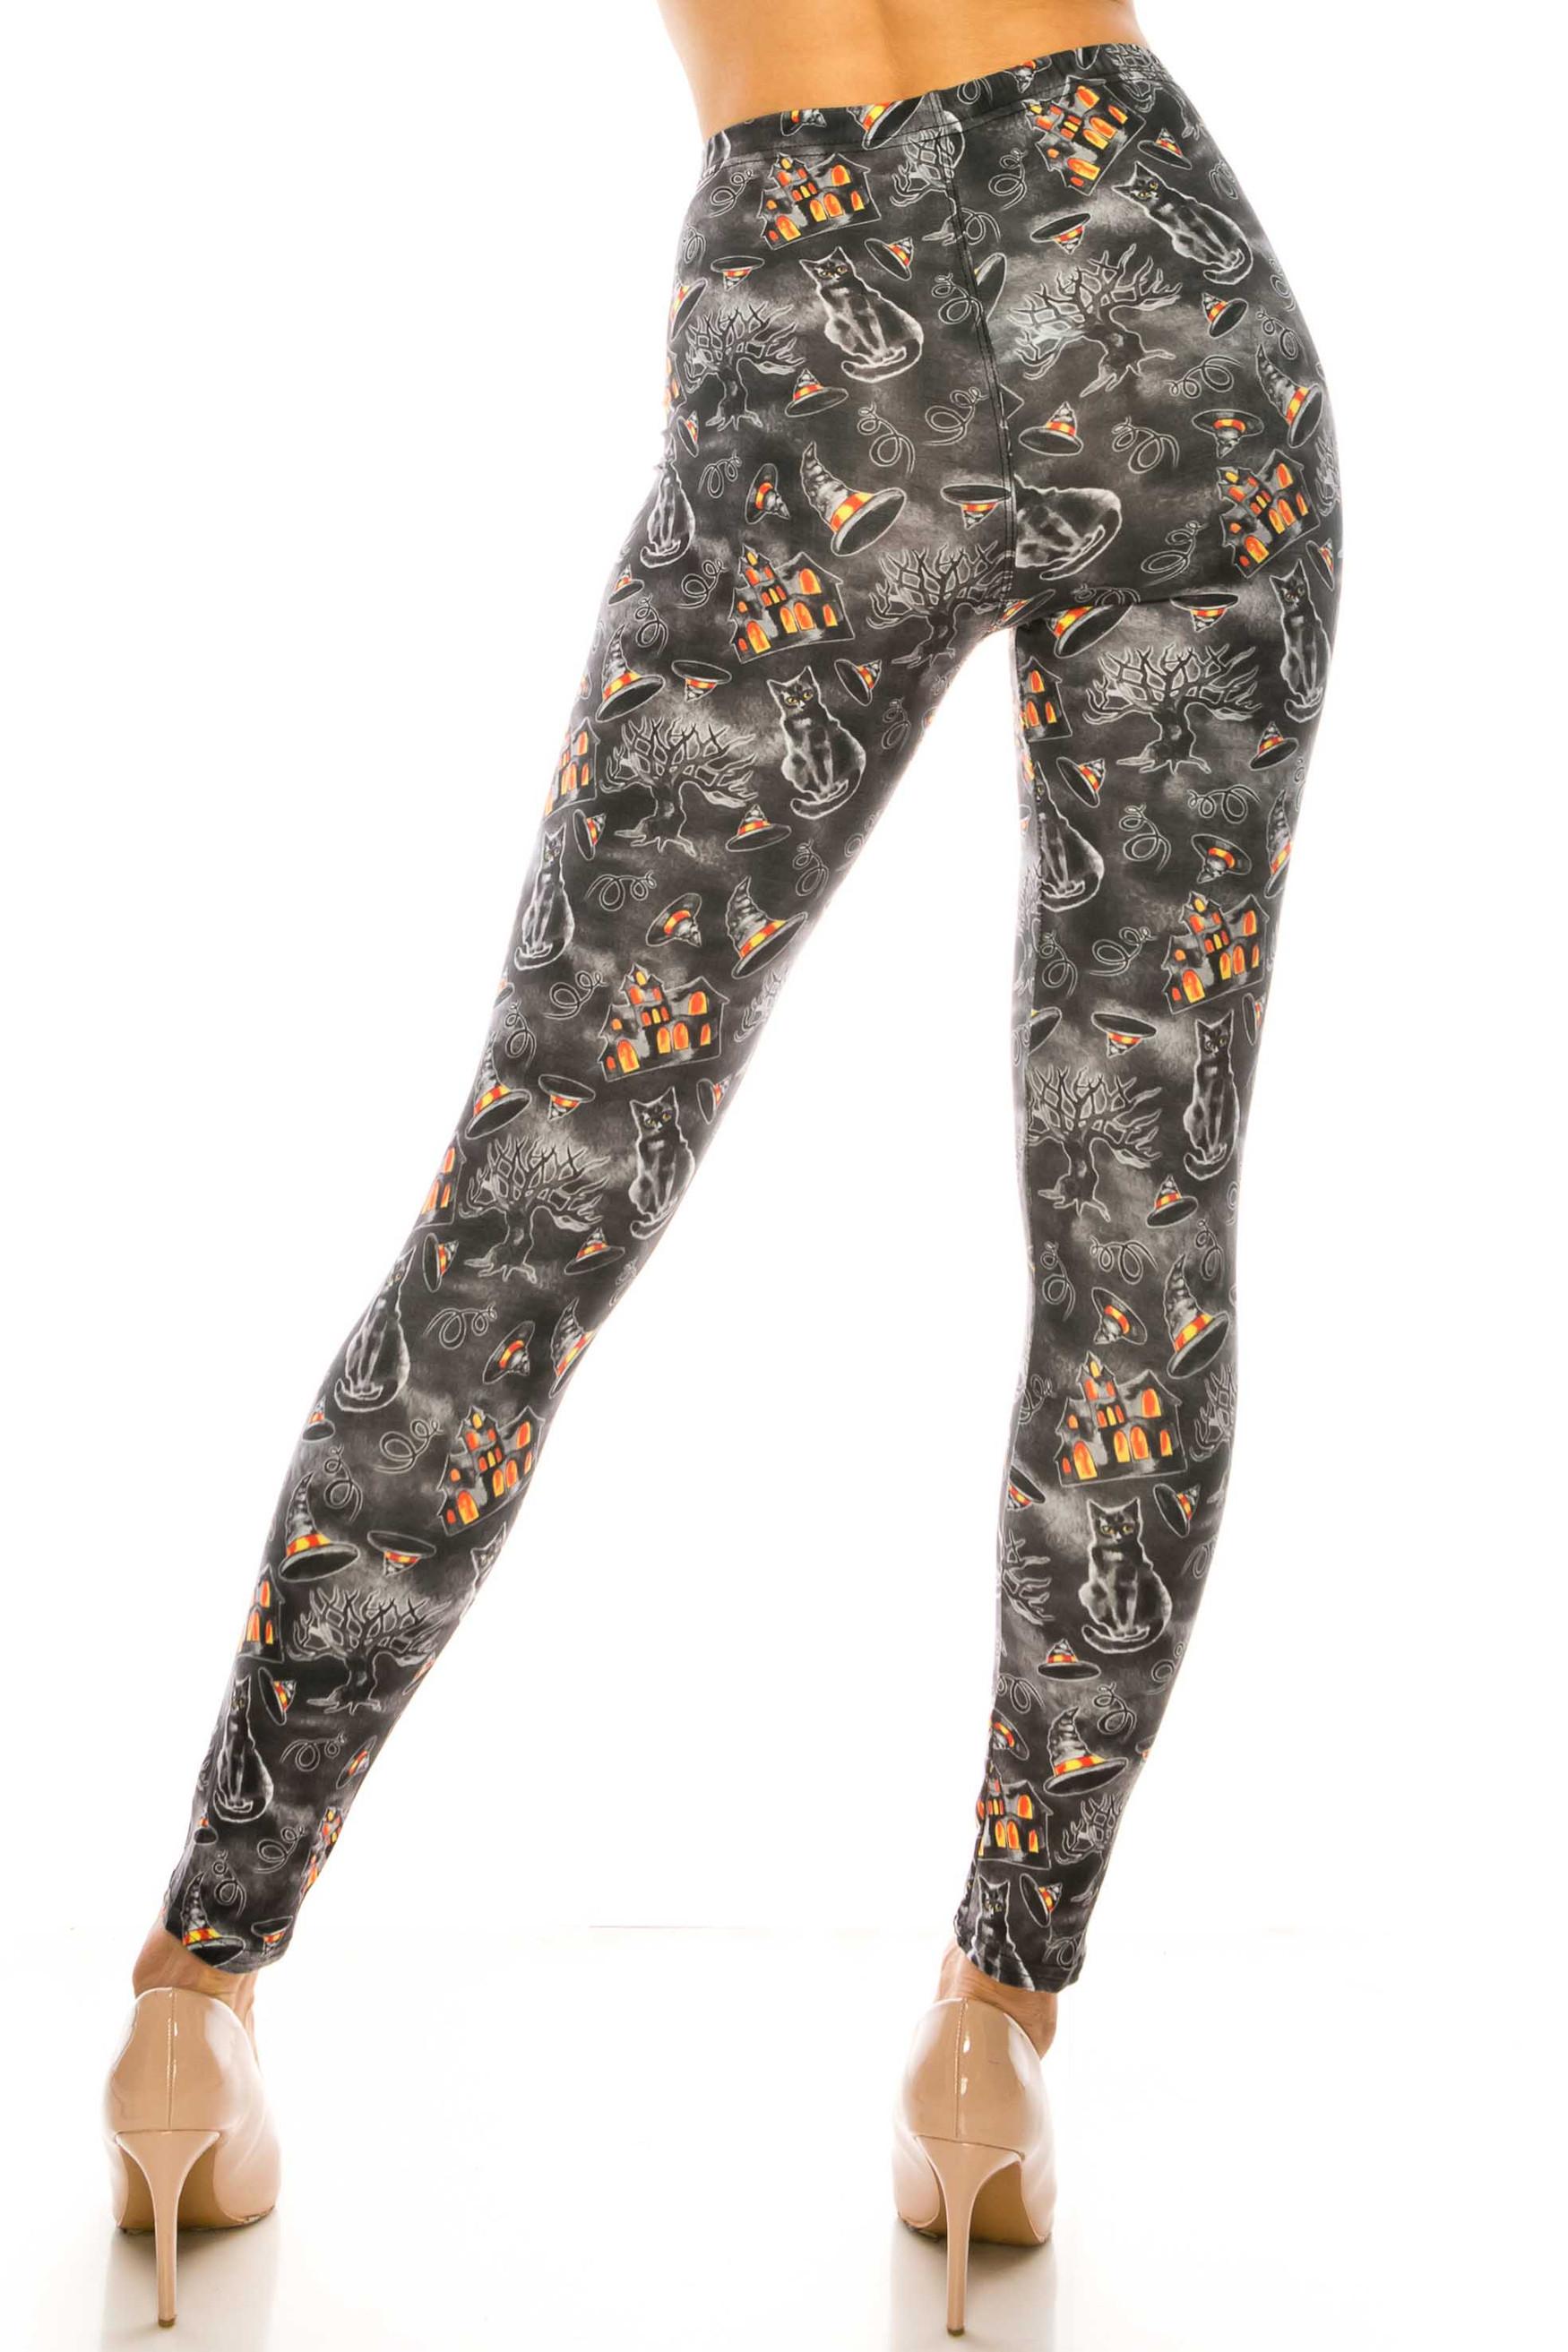 Creamy Soft Haunted Halloween Kids Leggings - USA Fashion™